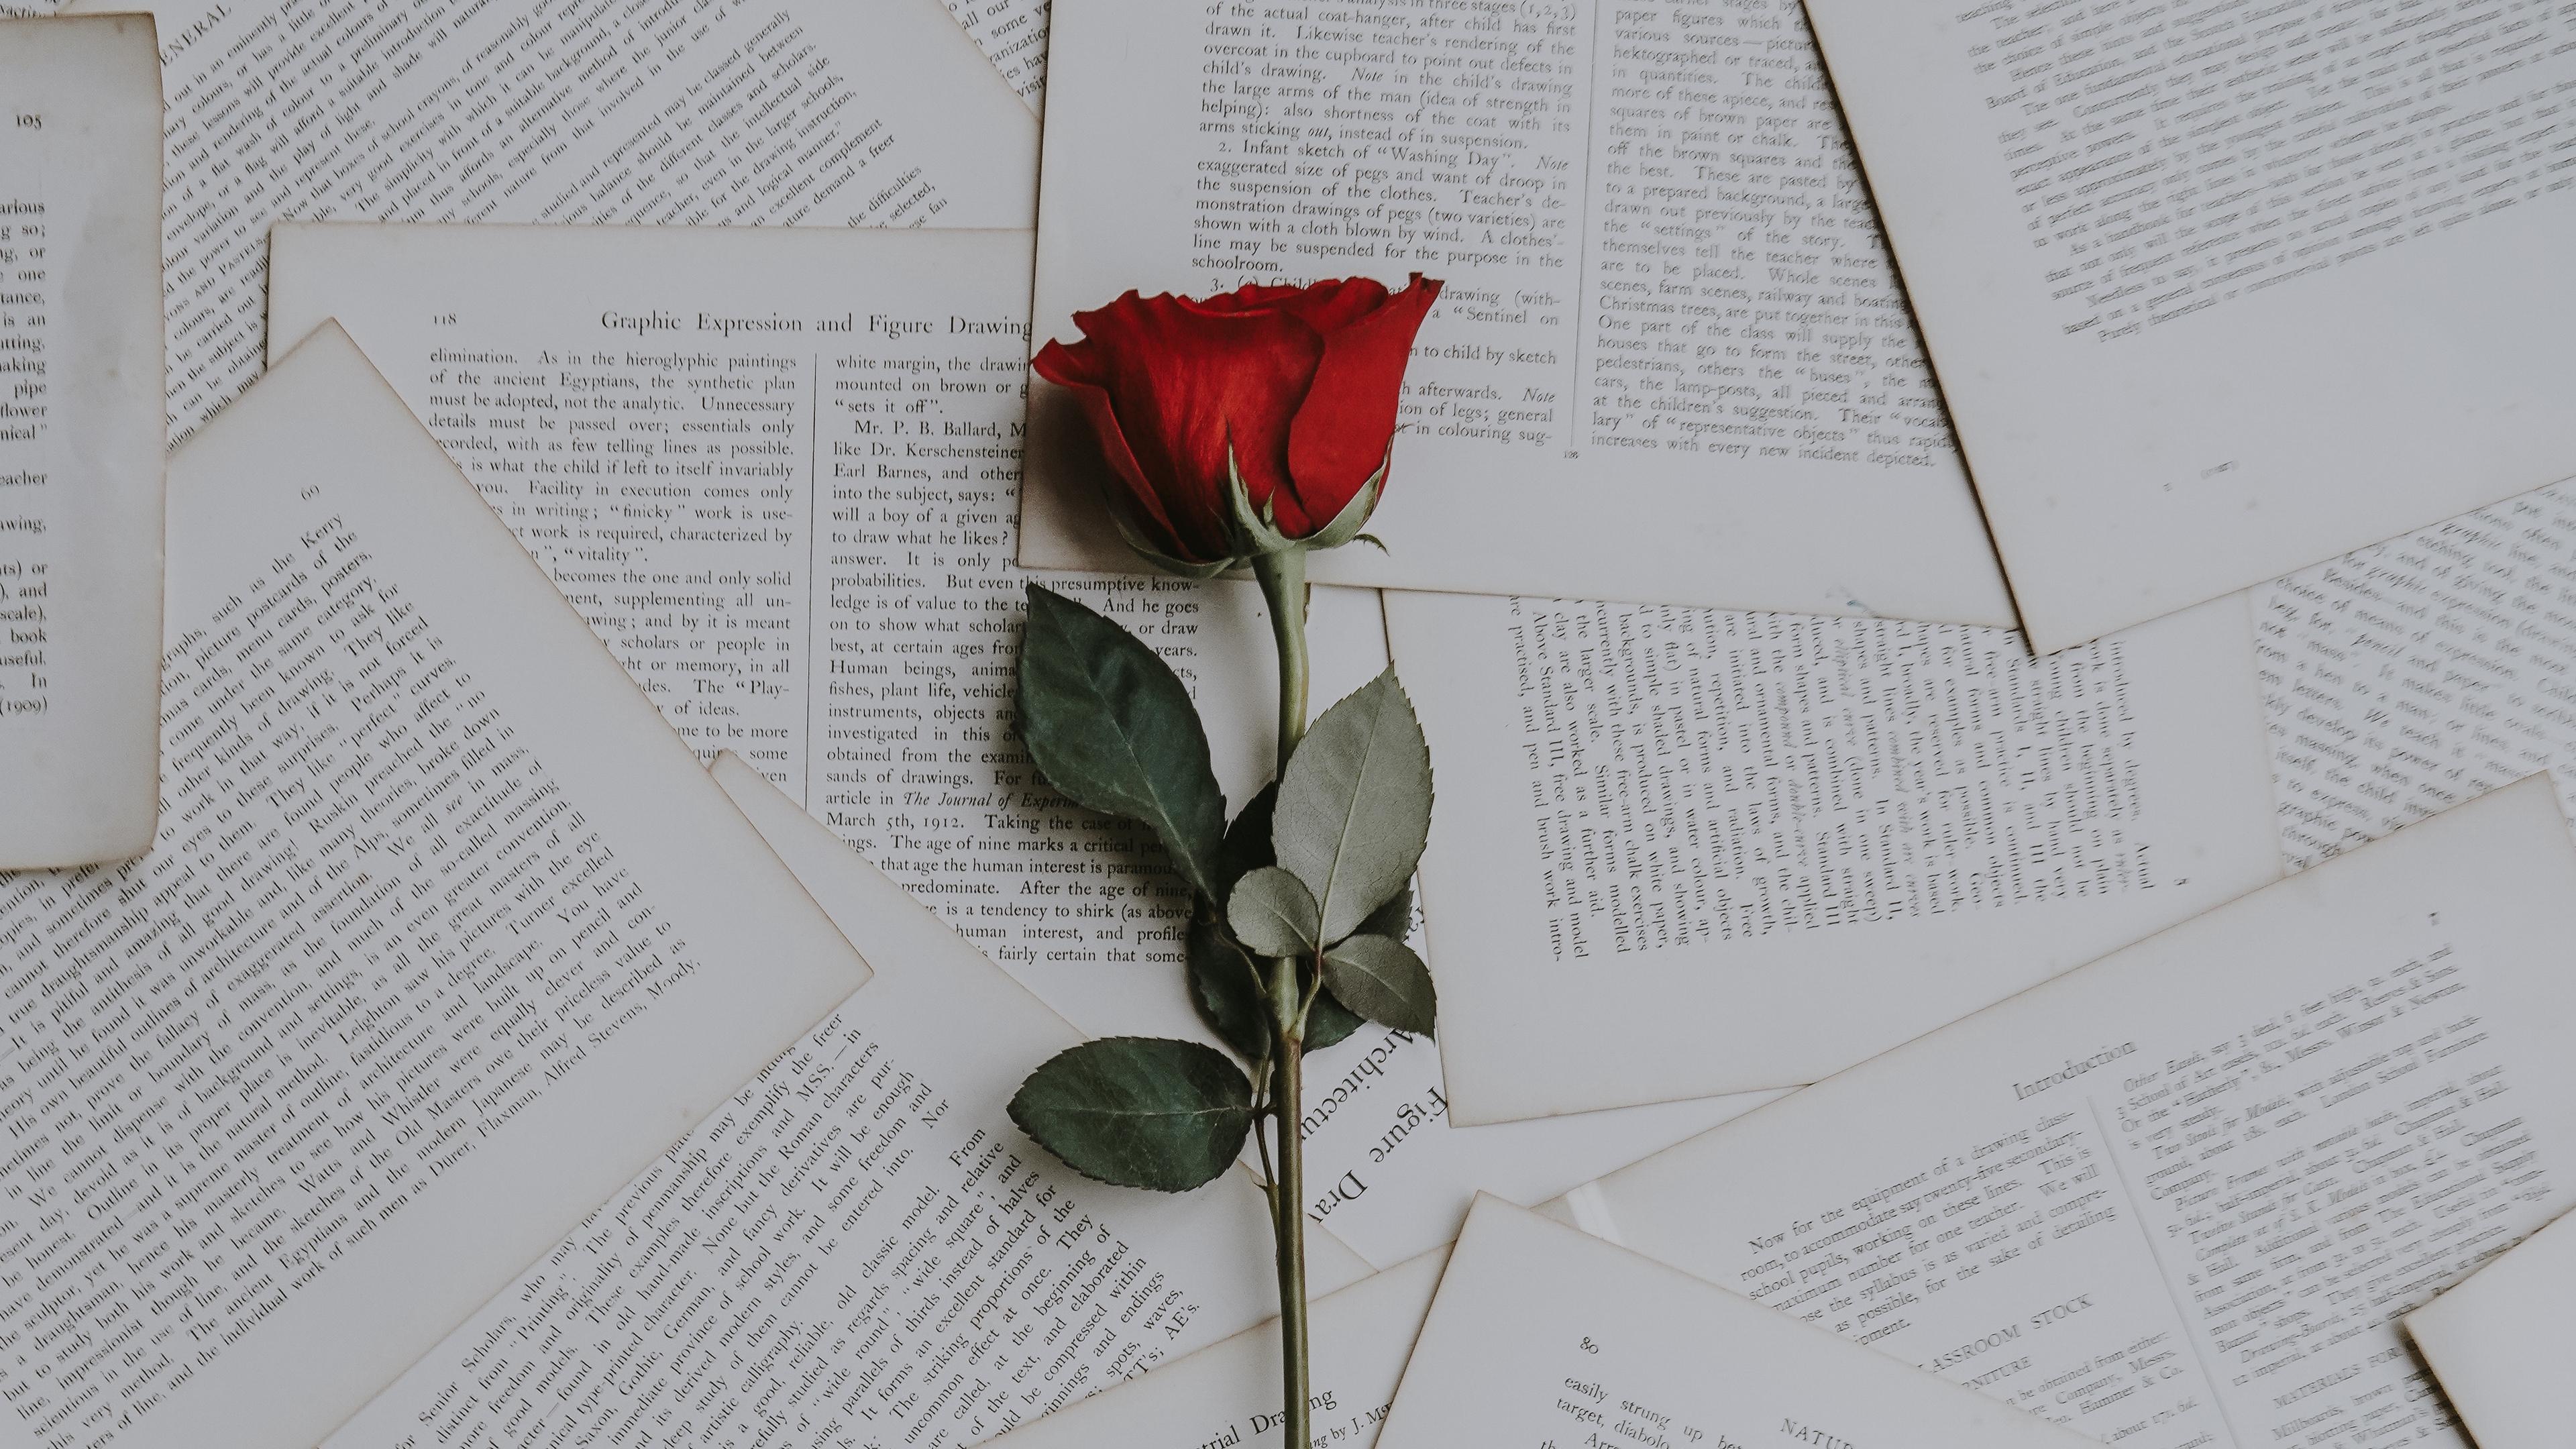 rose books texts 4k 1540064780 - rose, books, texts 4k - texts, Rose, books